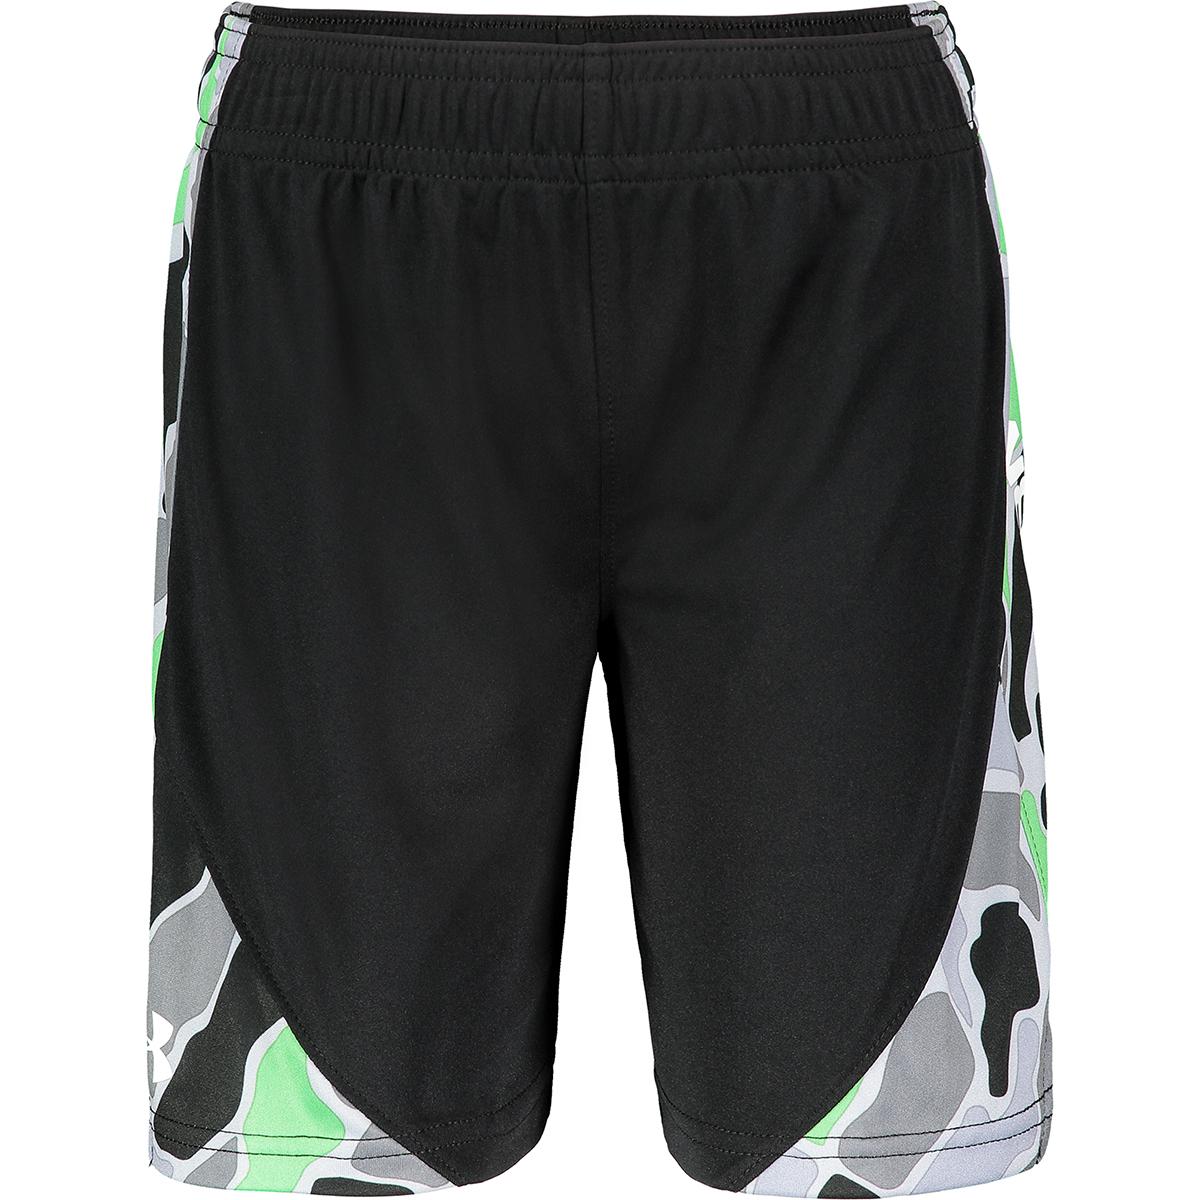 Under Armour Boys' Diverge Multi Stunt Shorts - Black, 7